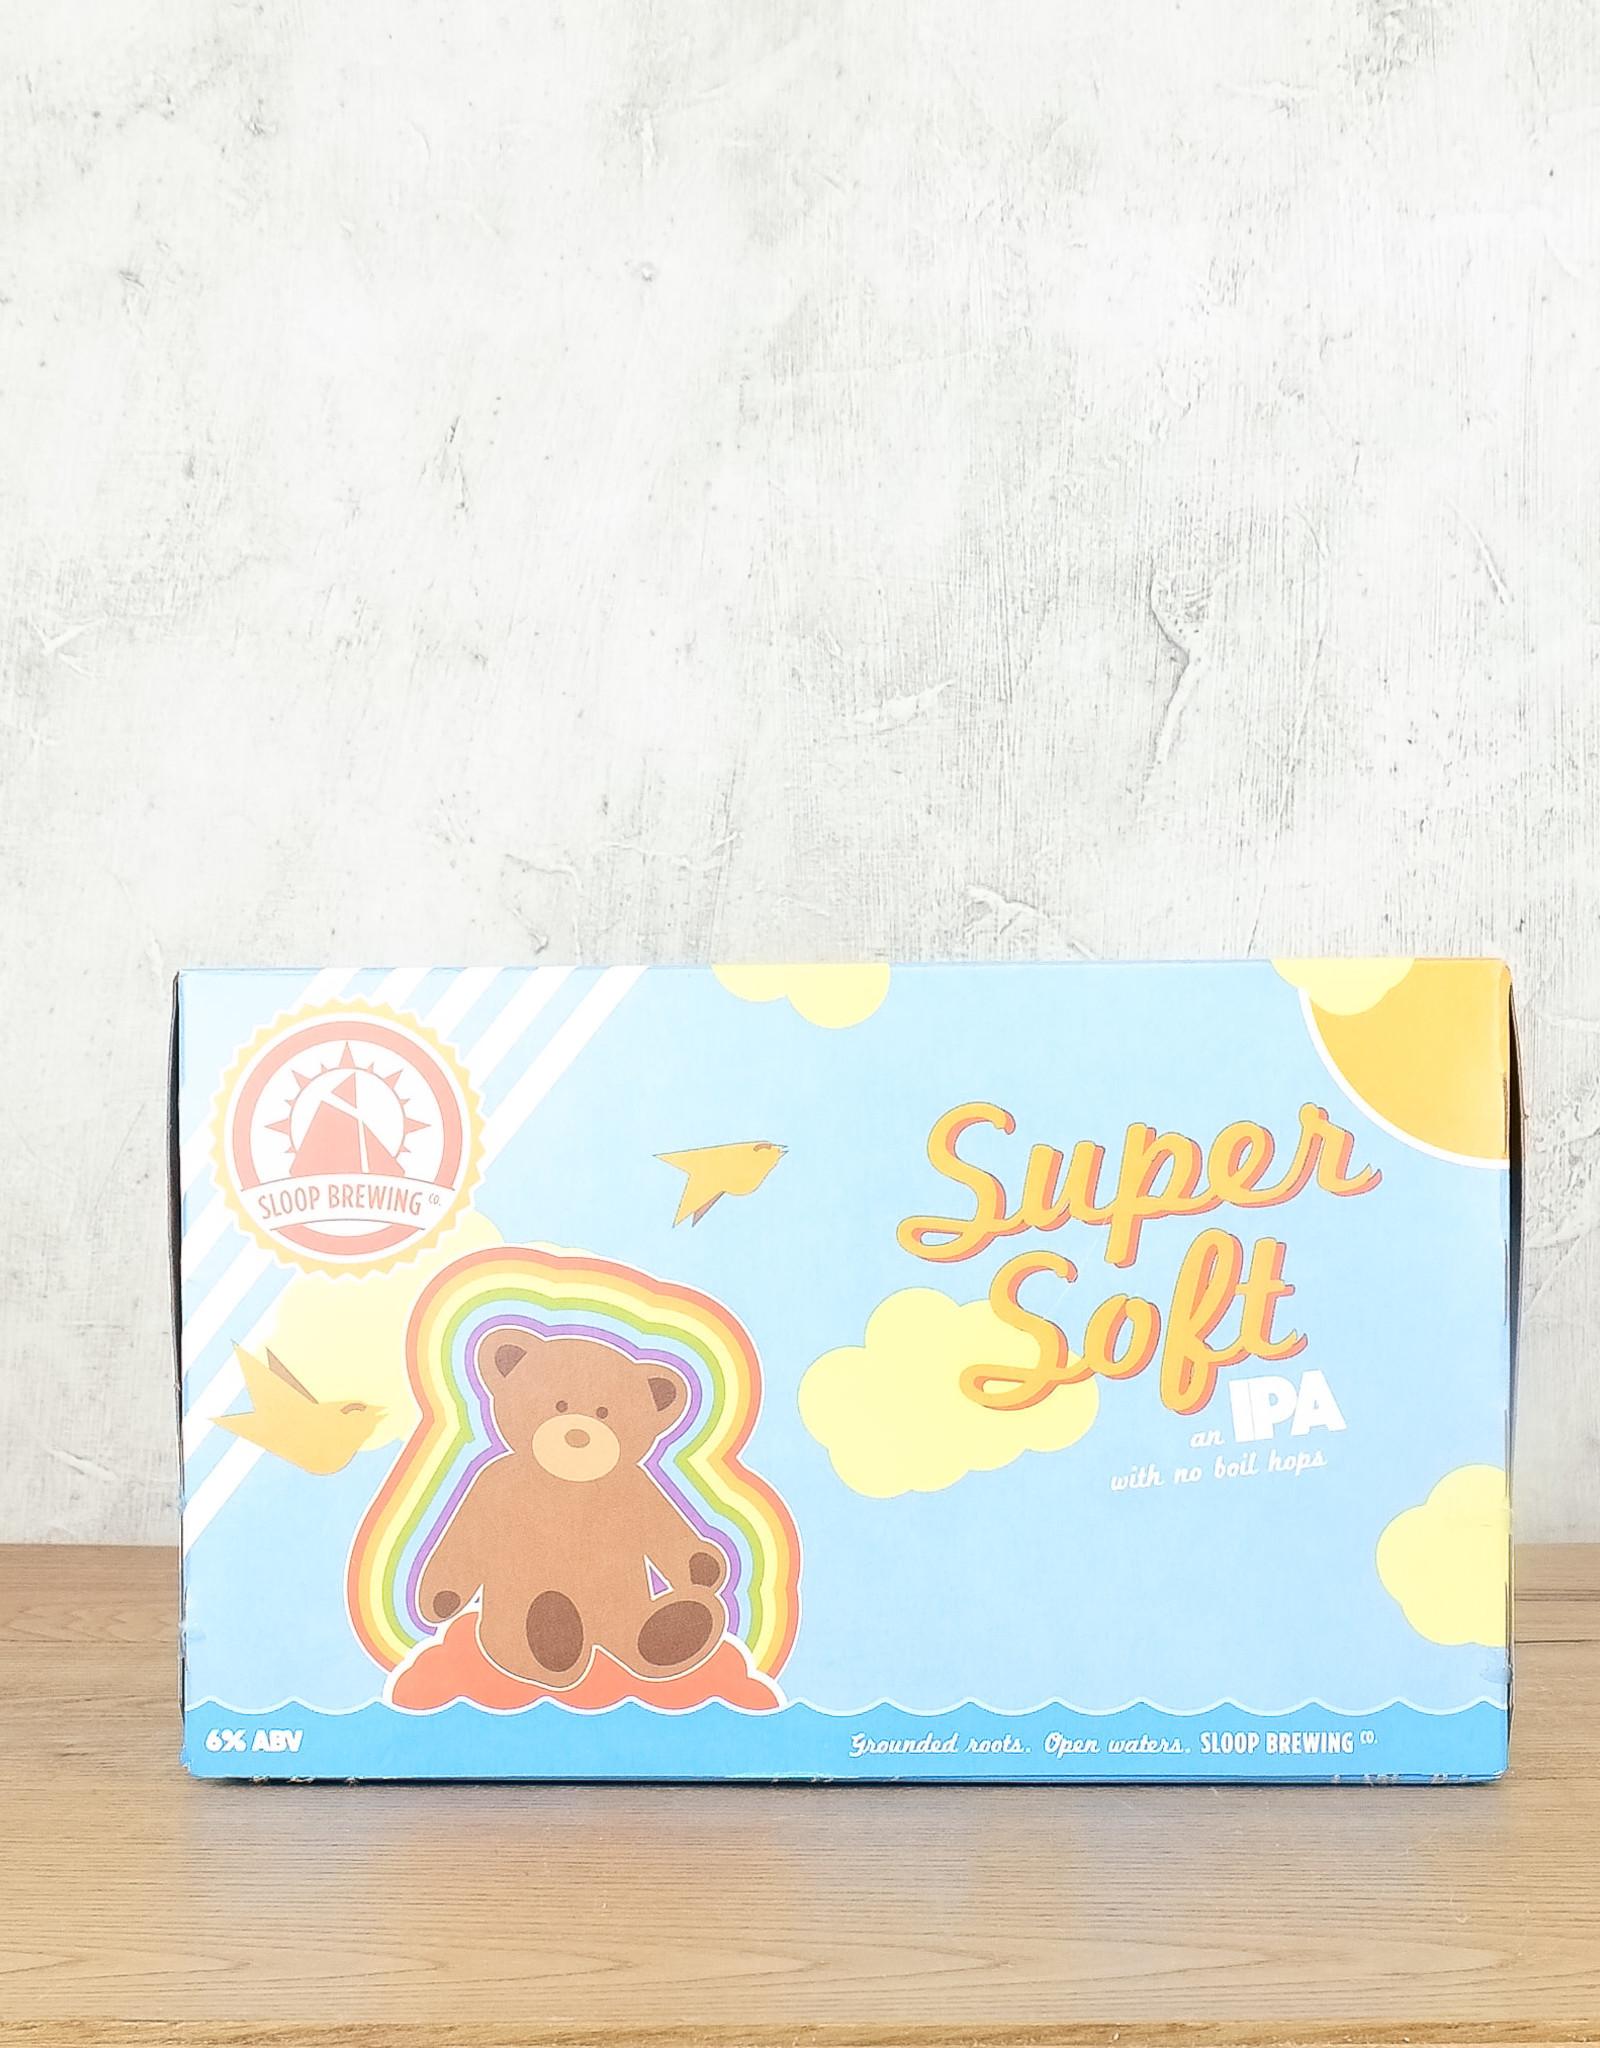 Sloop Brewing Super Soft IPA 6pk